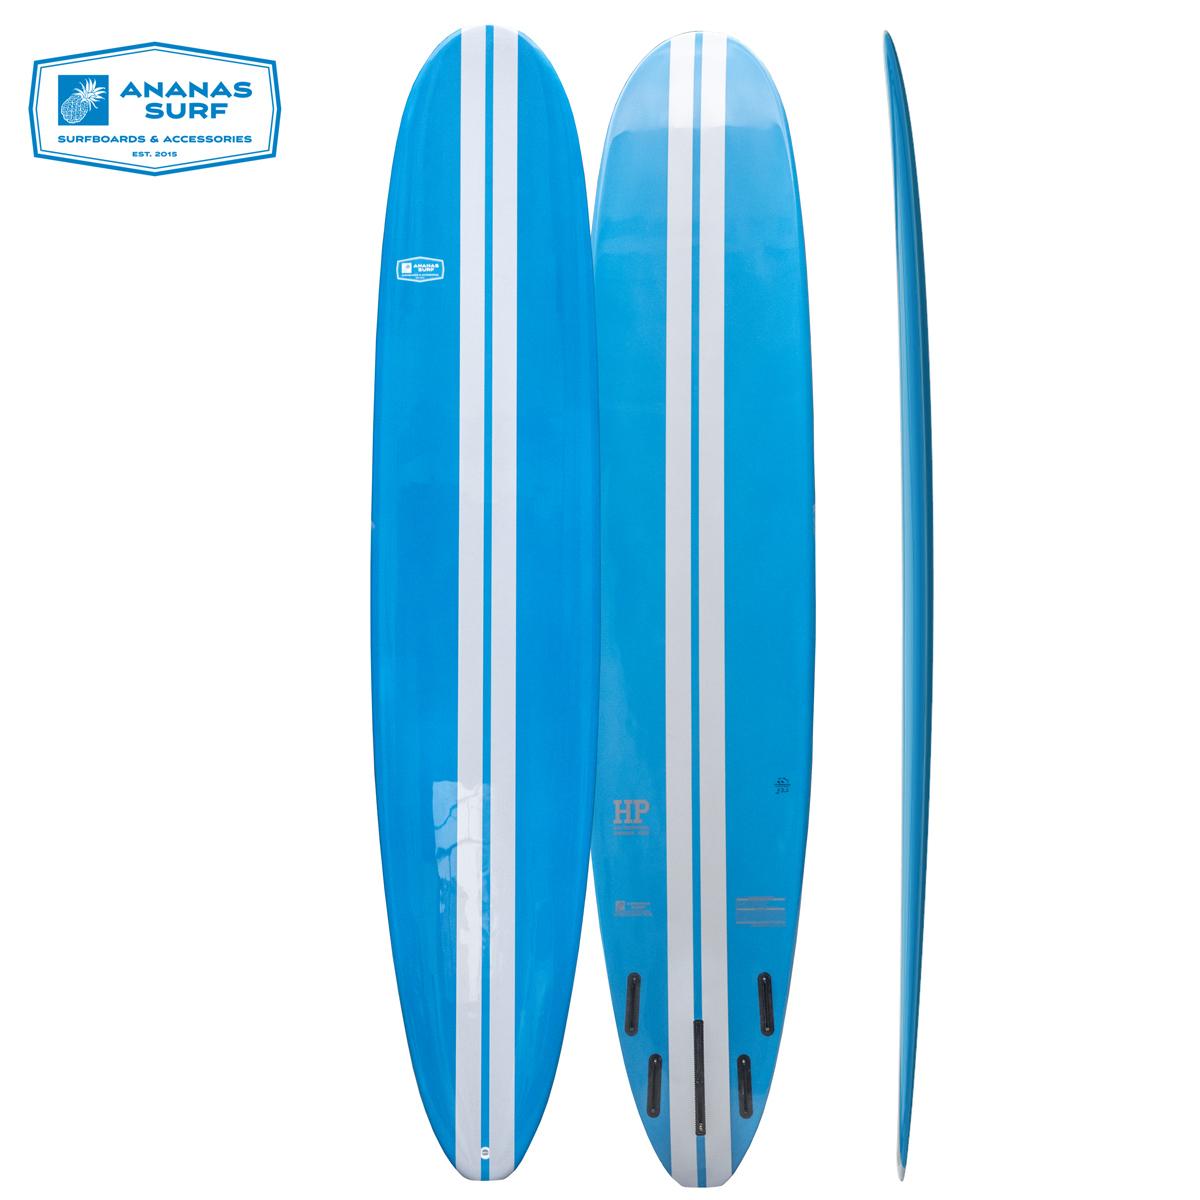 Ananas Surf High Perfomance longboard surfboard 2019 blue